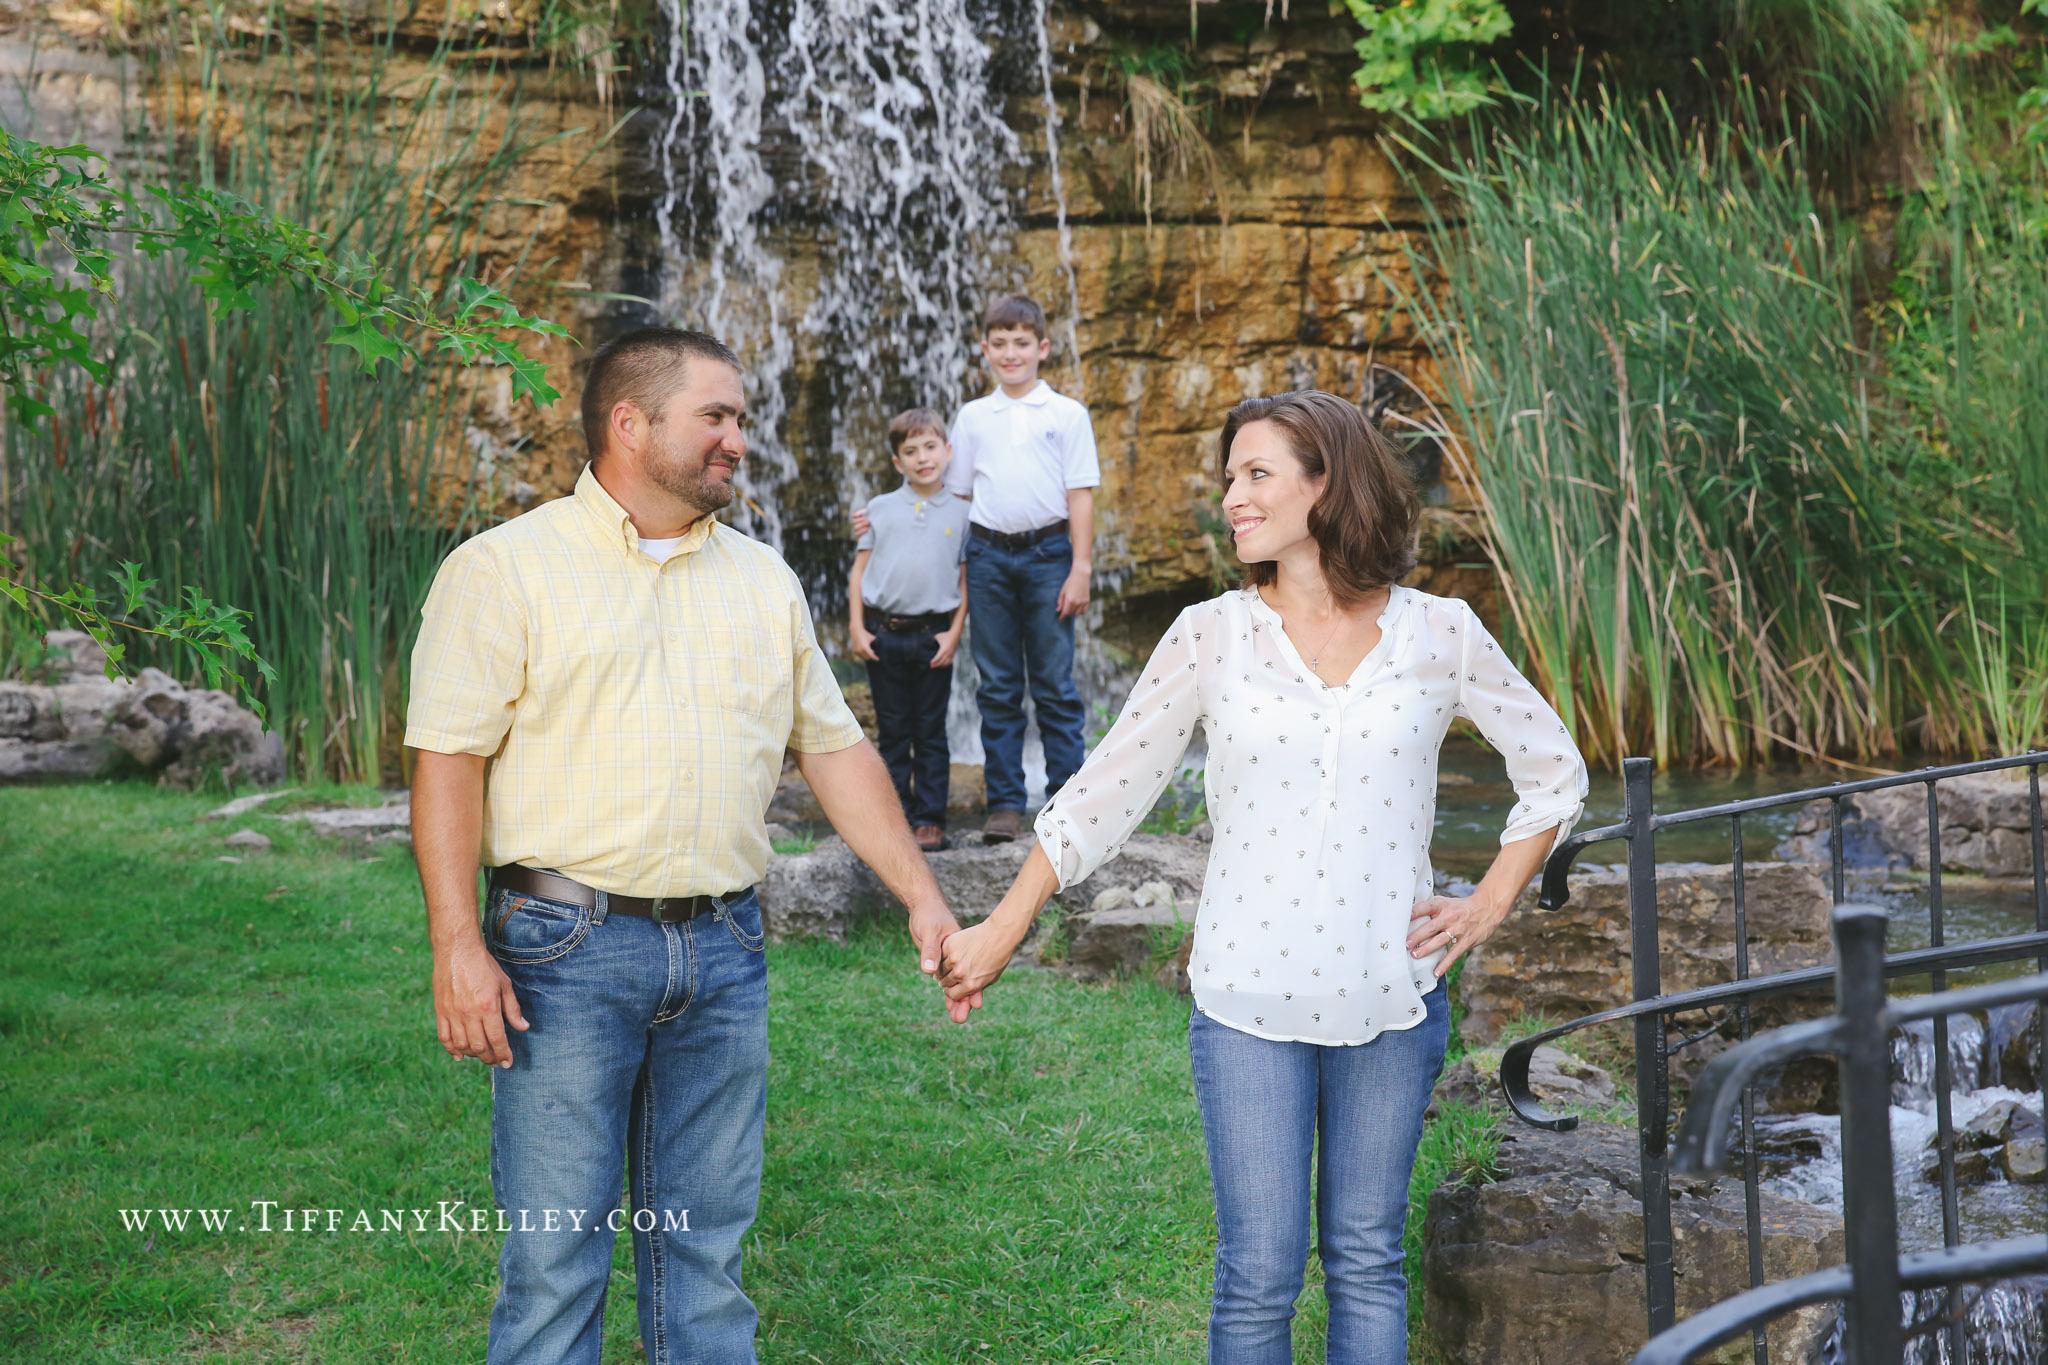 05 Big Cedar Lodge Photographer - Branson MO Family Photographer - Tiffany Kelley Photography